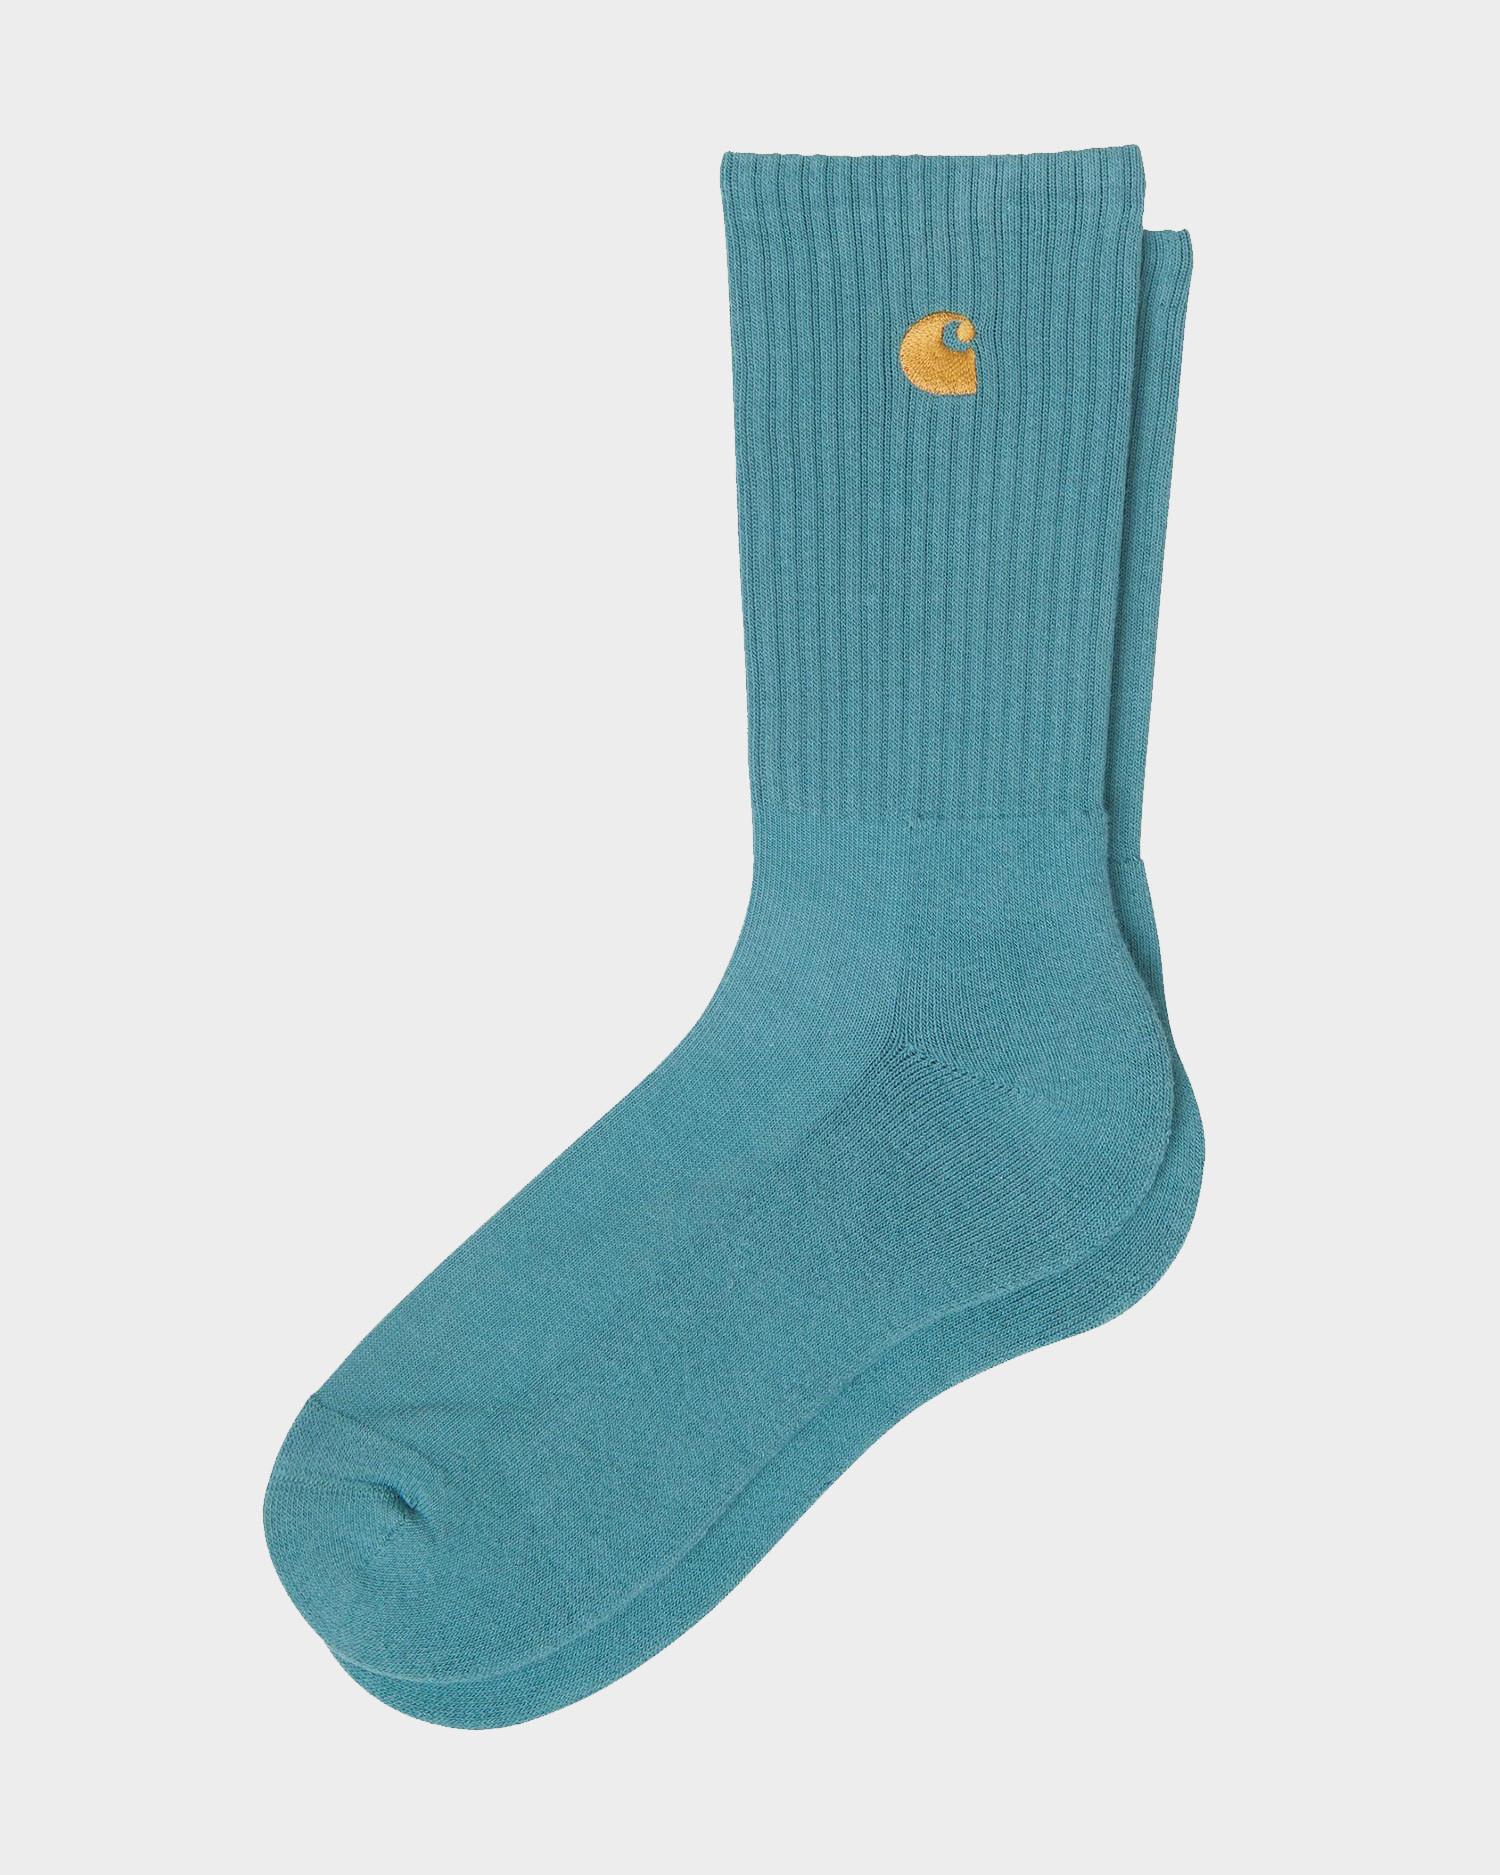 Carhartt Chase Socks Hydro/Gold